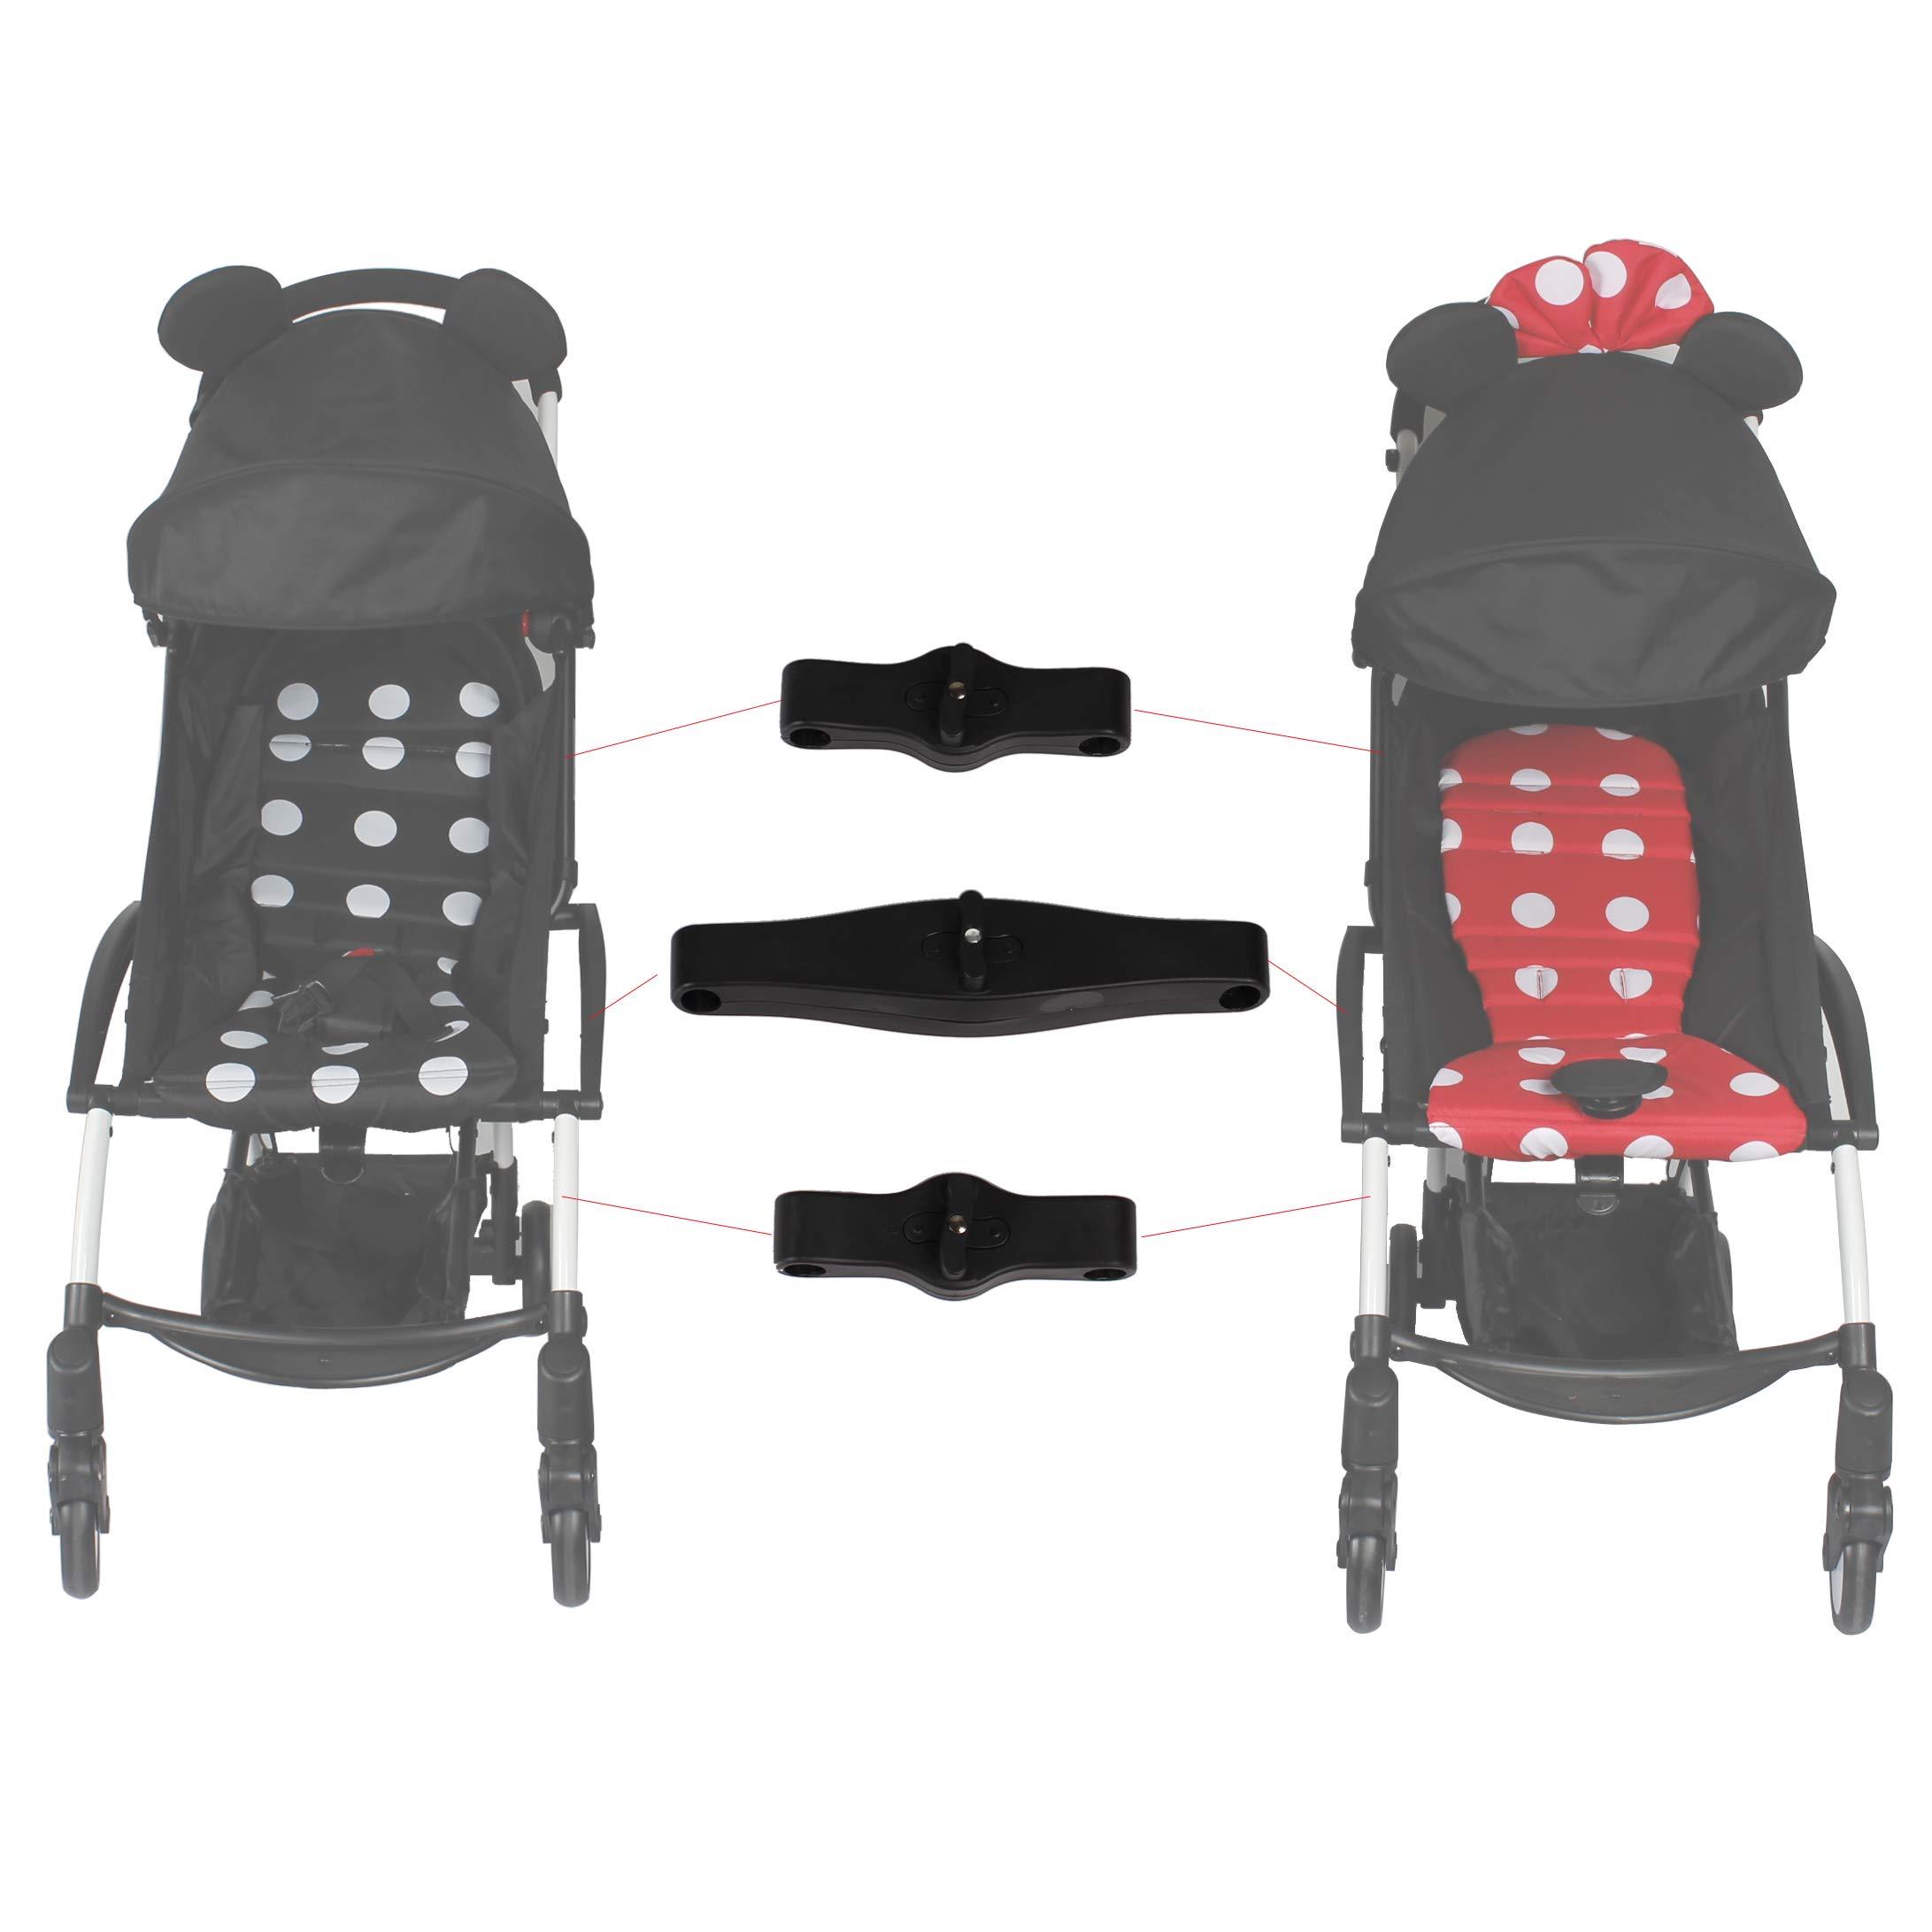 Stroller Connectors for Babyzen YOYO YOYO+ Strollers,Turns Two Single Strollers into a Double Stroller